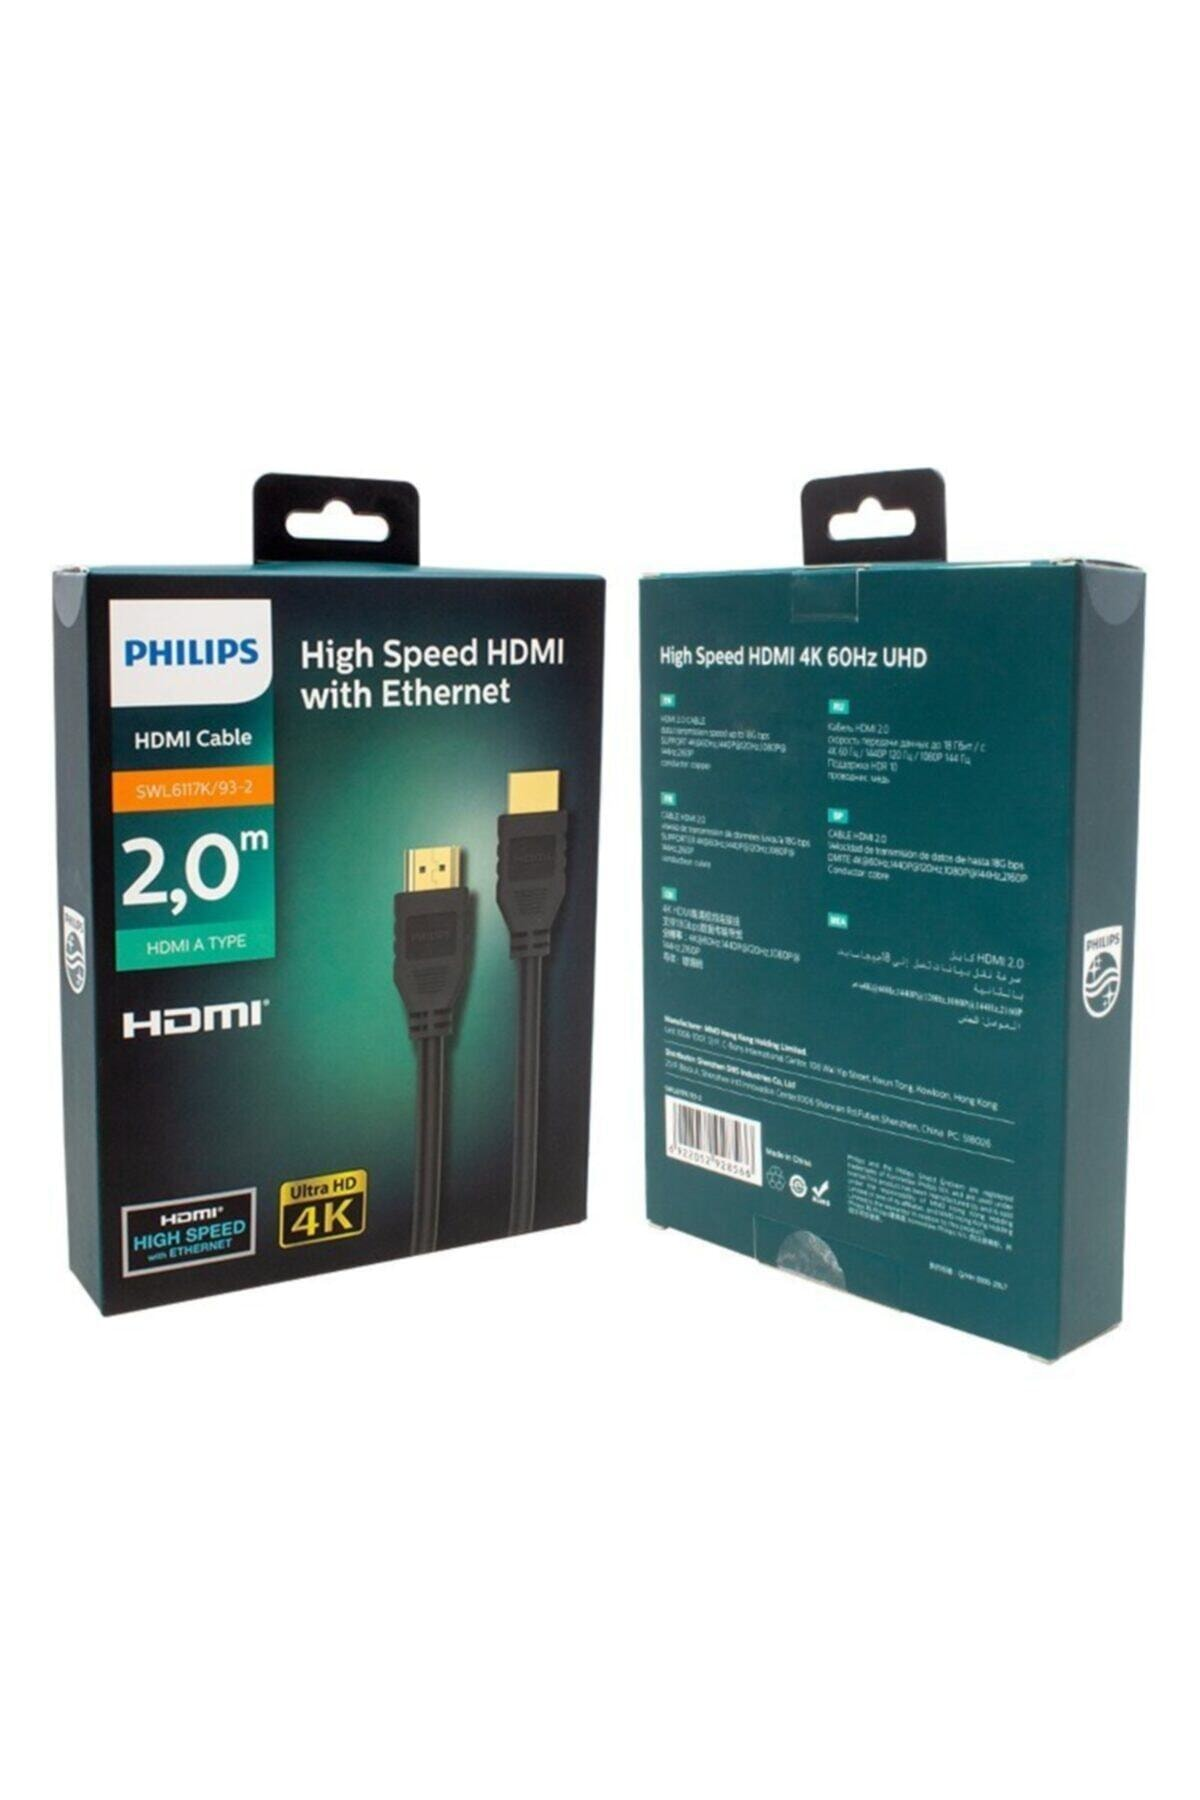 2 Metre Hdmı Kablo Altın Uçlu 4k Ultra High Speed With Ethernet Hd Kablo Swl6117k/93-2